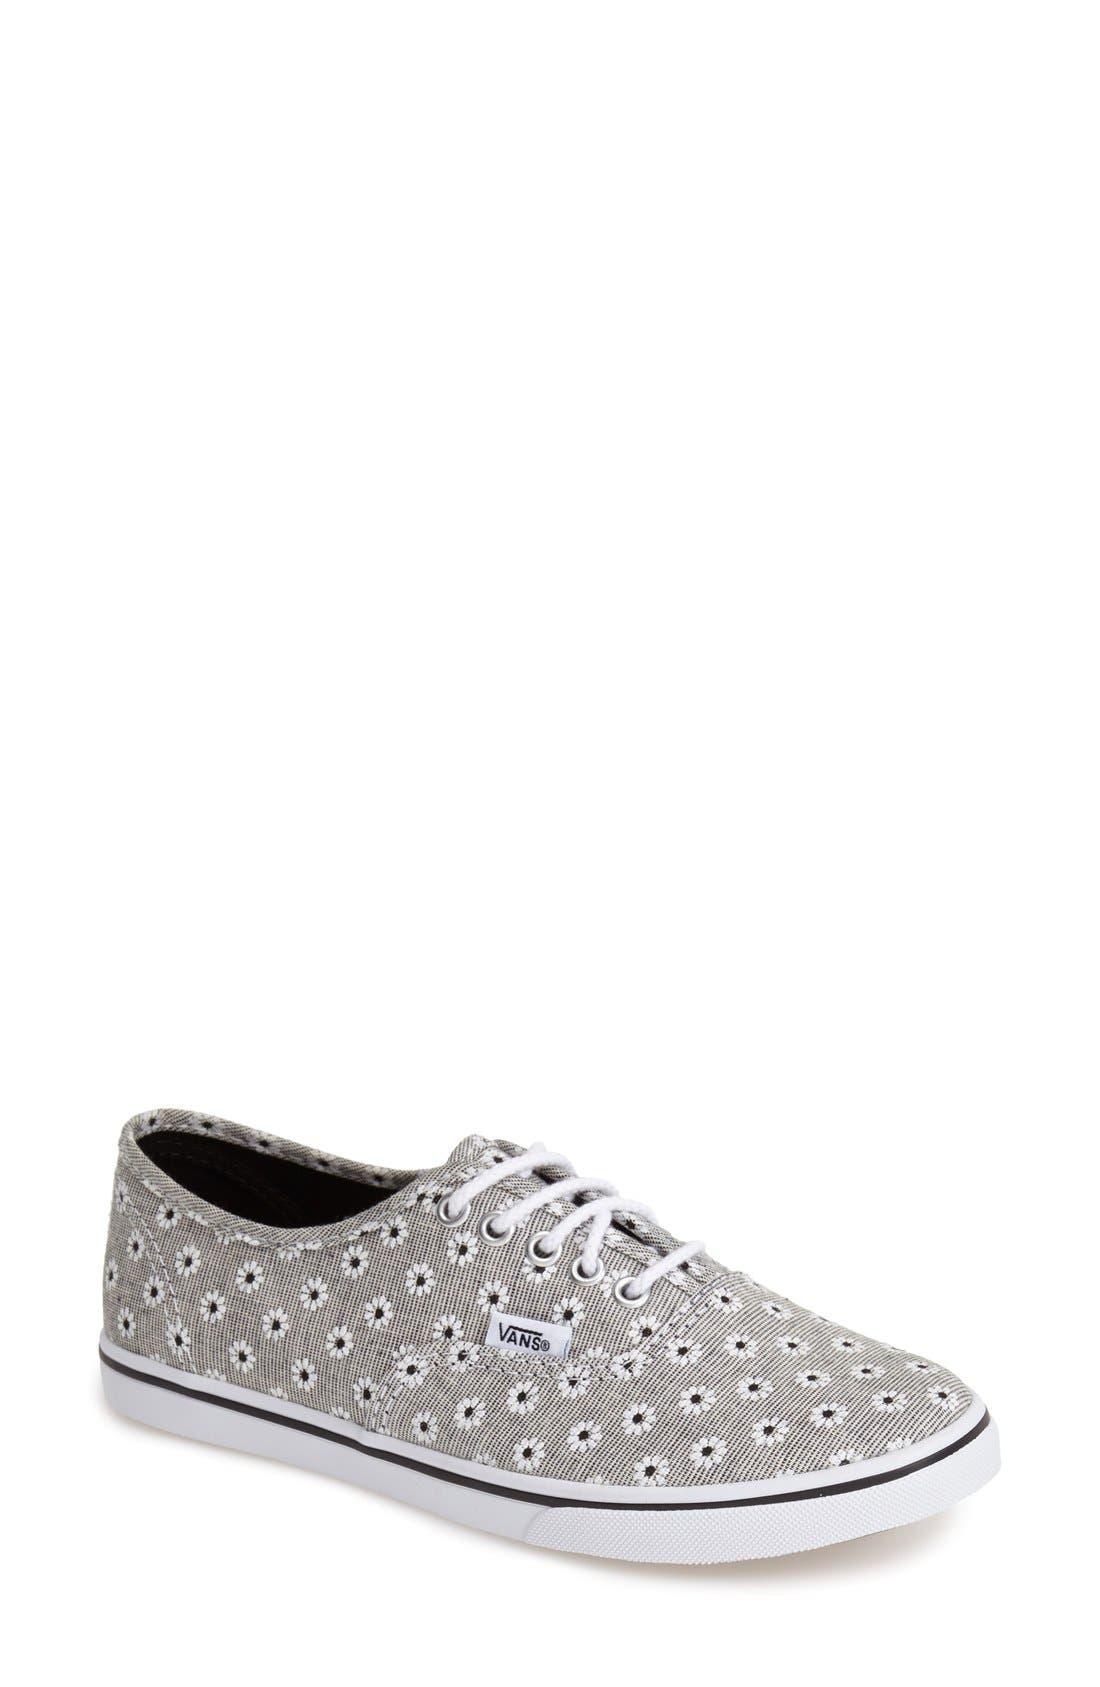 Main Image - Vans 'Authentic - Chambray' Sneaker (Women)